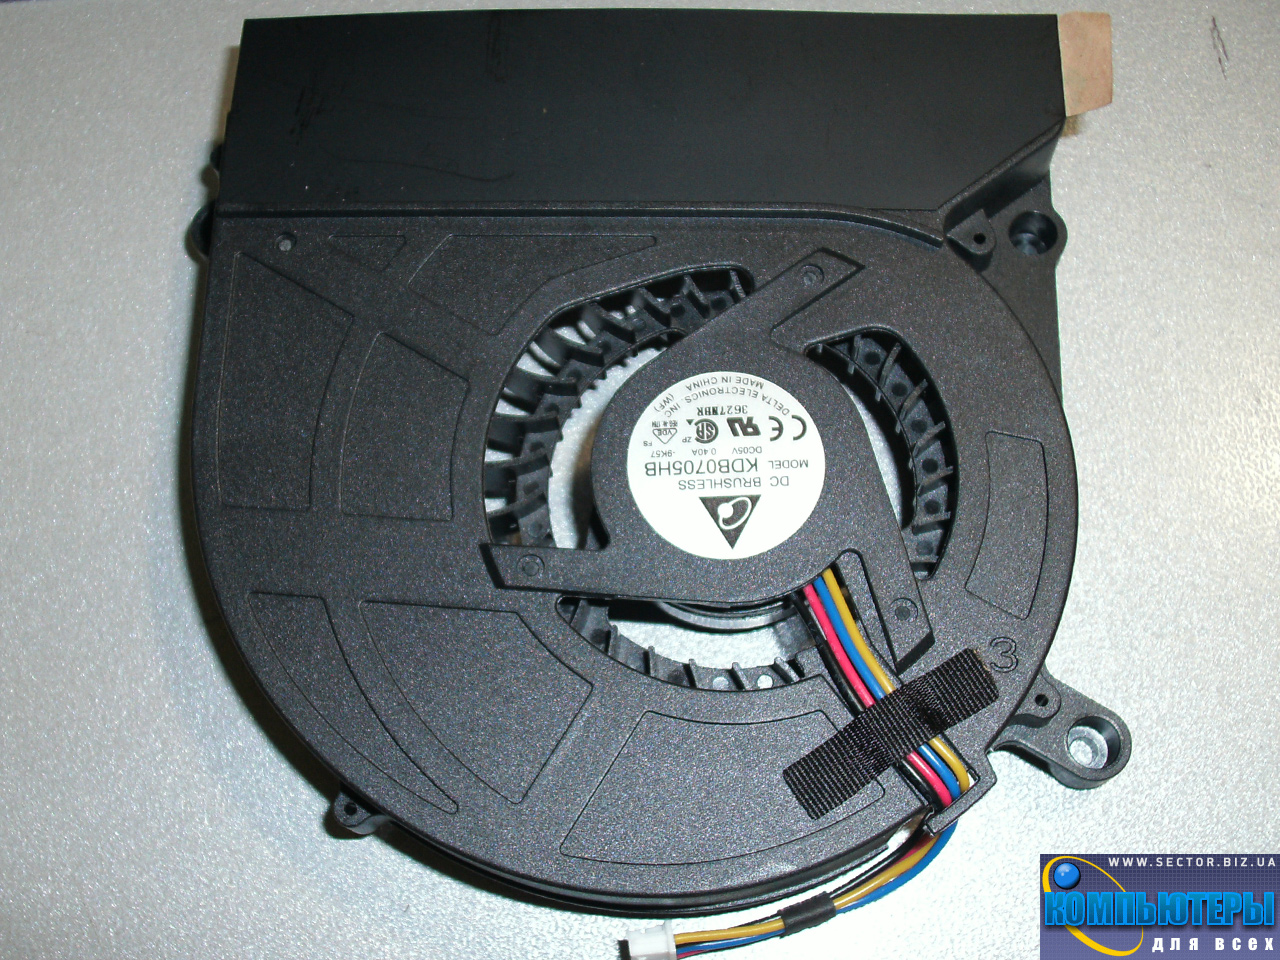 Кулер к ноутбуку Asus X5D X5DI X5DC X5DAF X5 K60 K61IC K70 K70AB K70C p/n: KDB0705HB-9K57. Фото № 2.